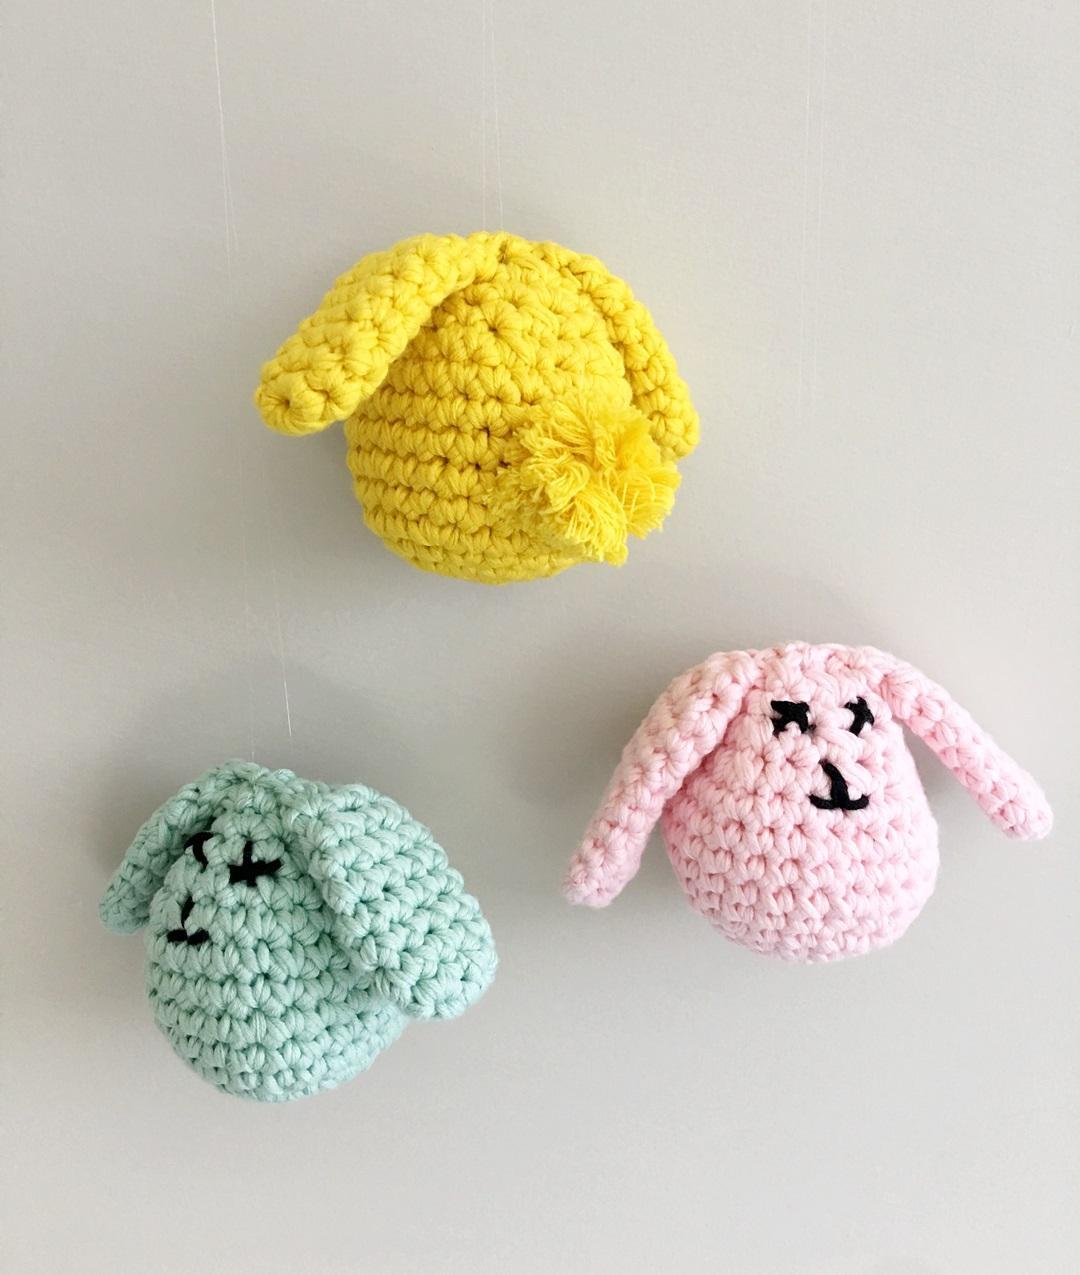 Bunny Rabbit Amigurumi - Free Crochet Pattern - StringyDingDing | 1275x1080